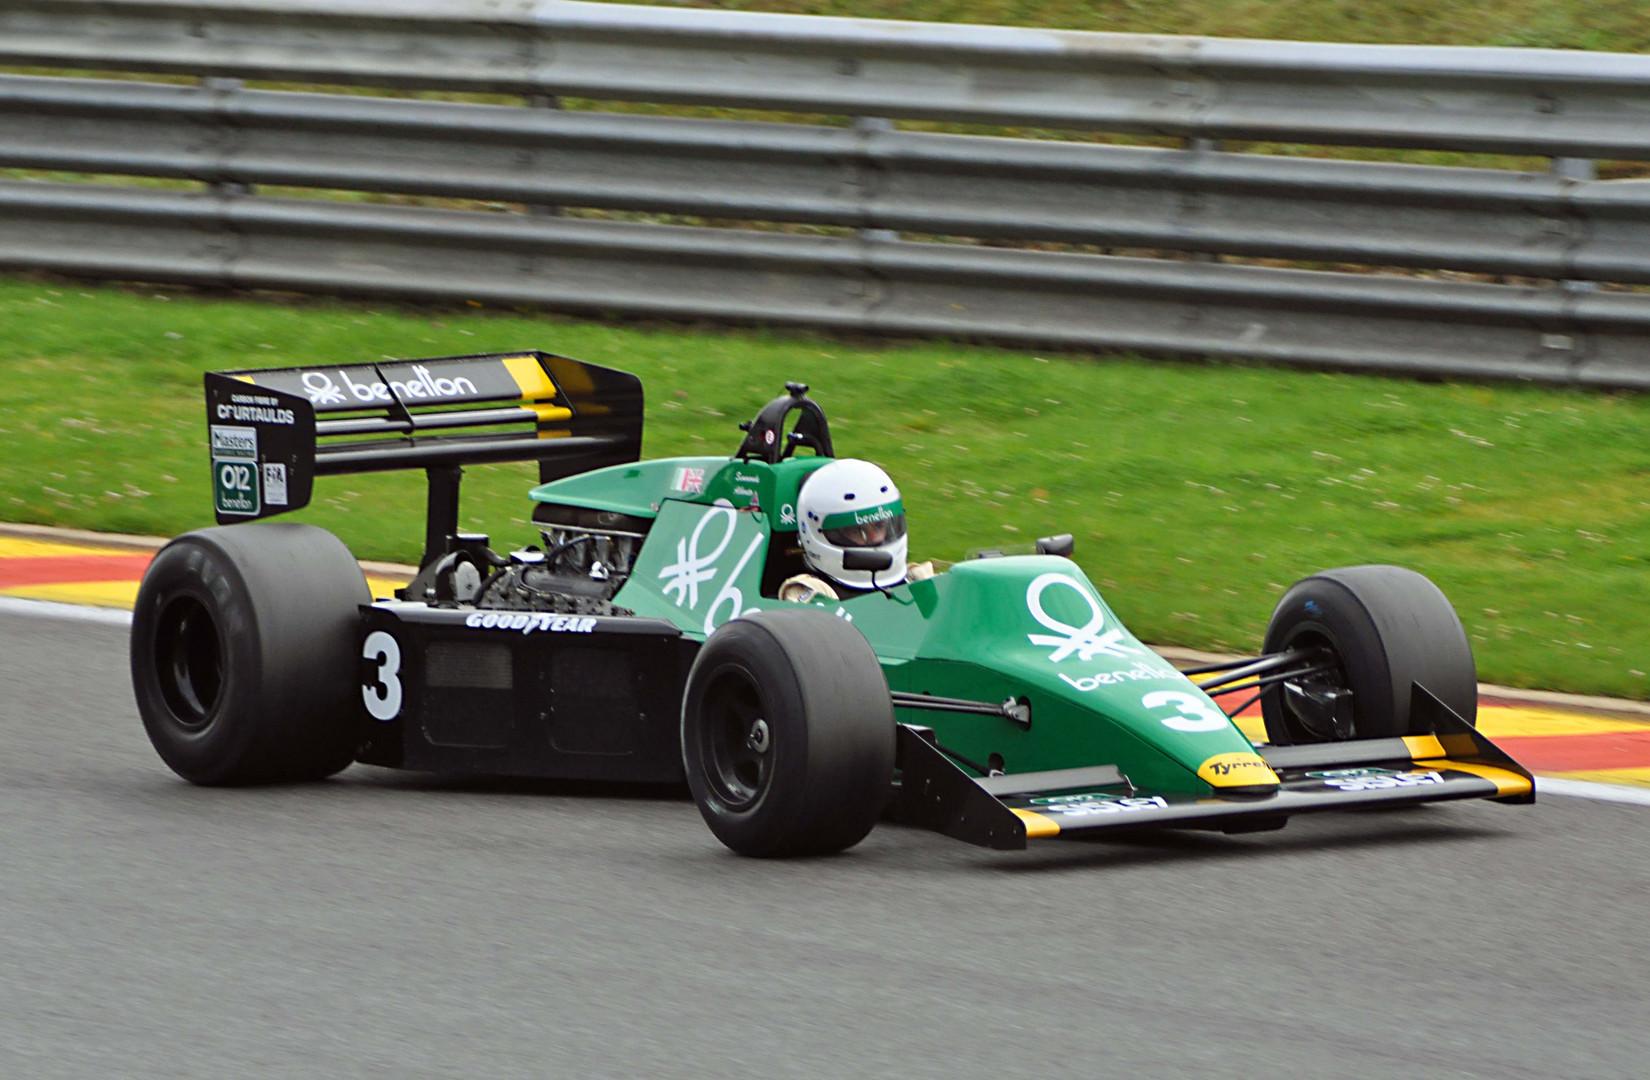 # 3 Tyrell 012 Bj.1983 (Ex Michele Alboreto)